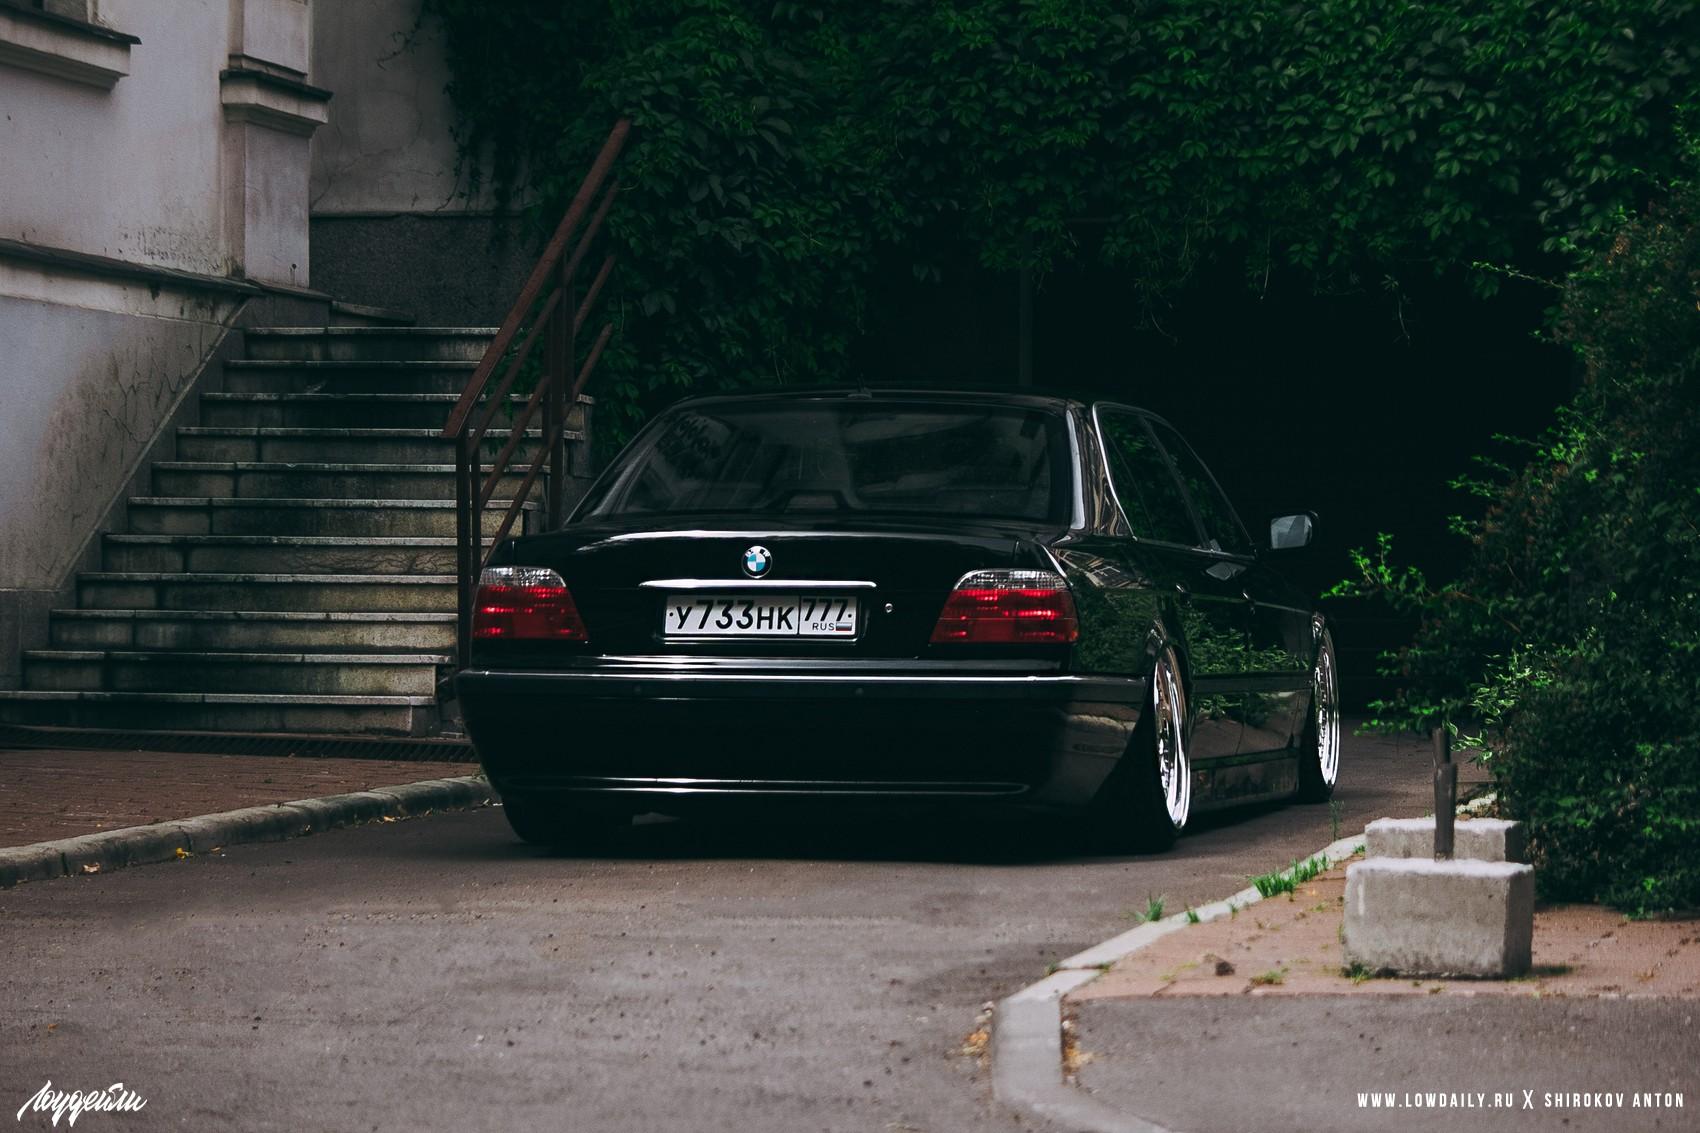 BMW E38 Lowdaily _MG_7121